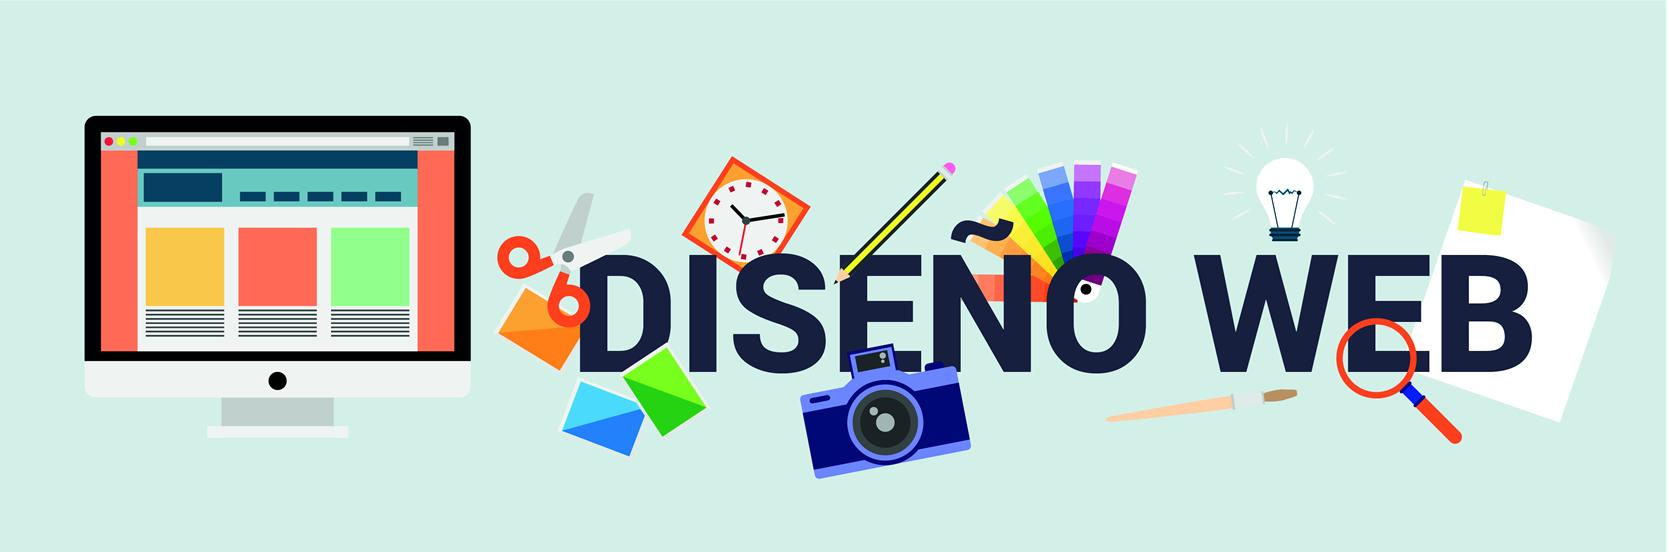 diseno-web-banner-responsive